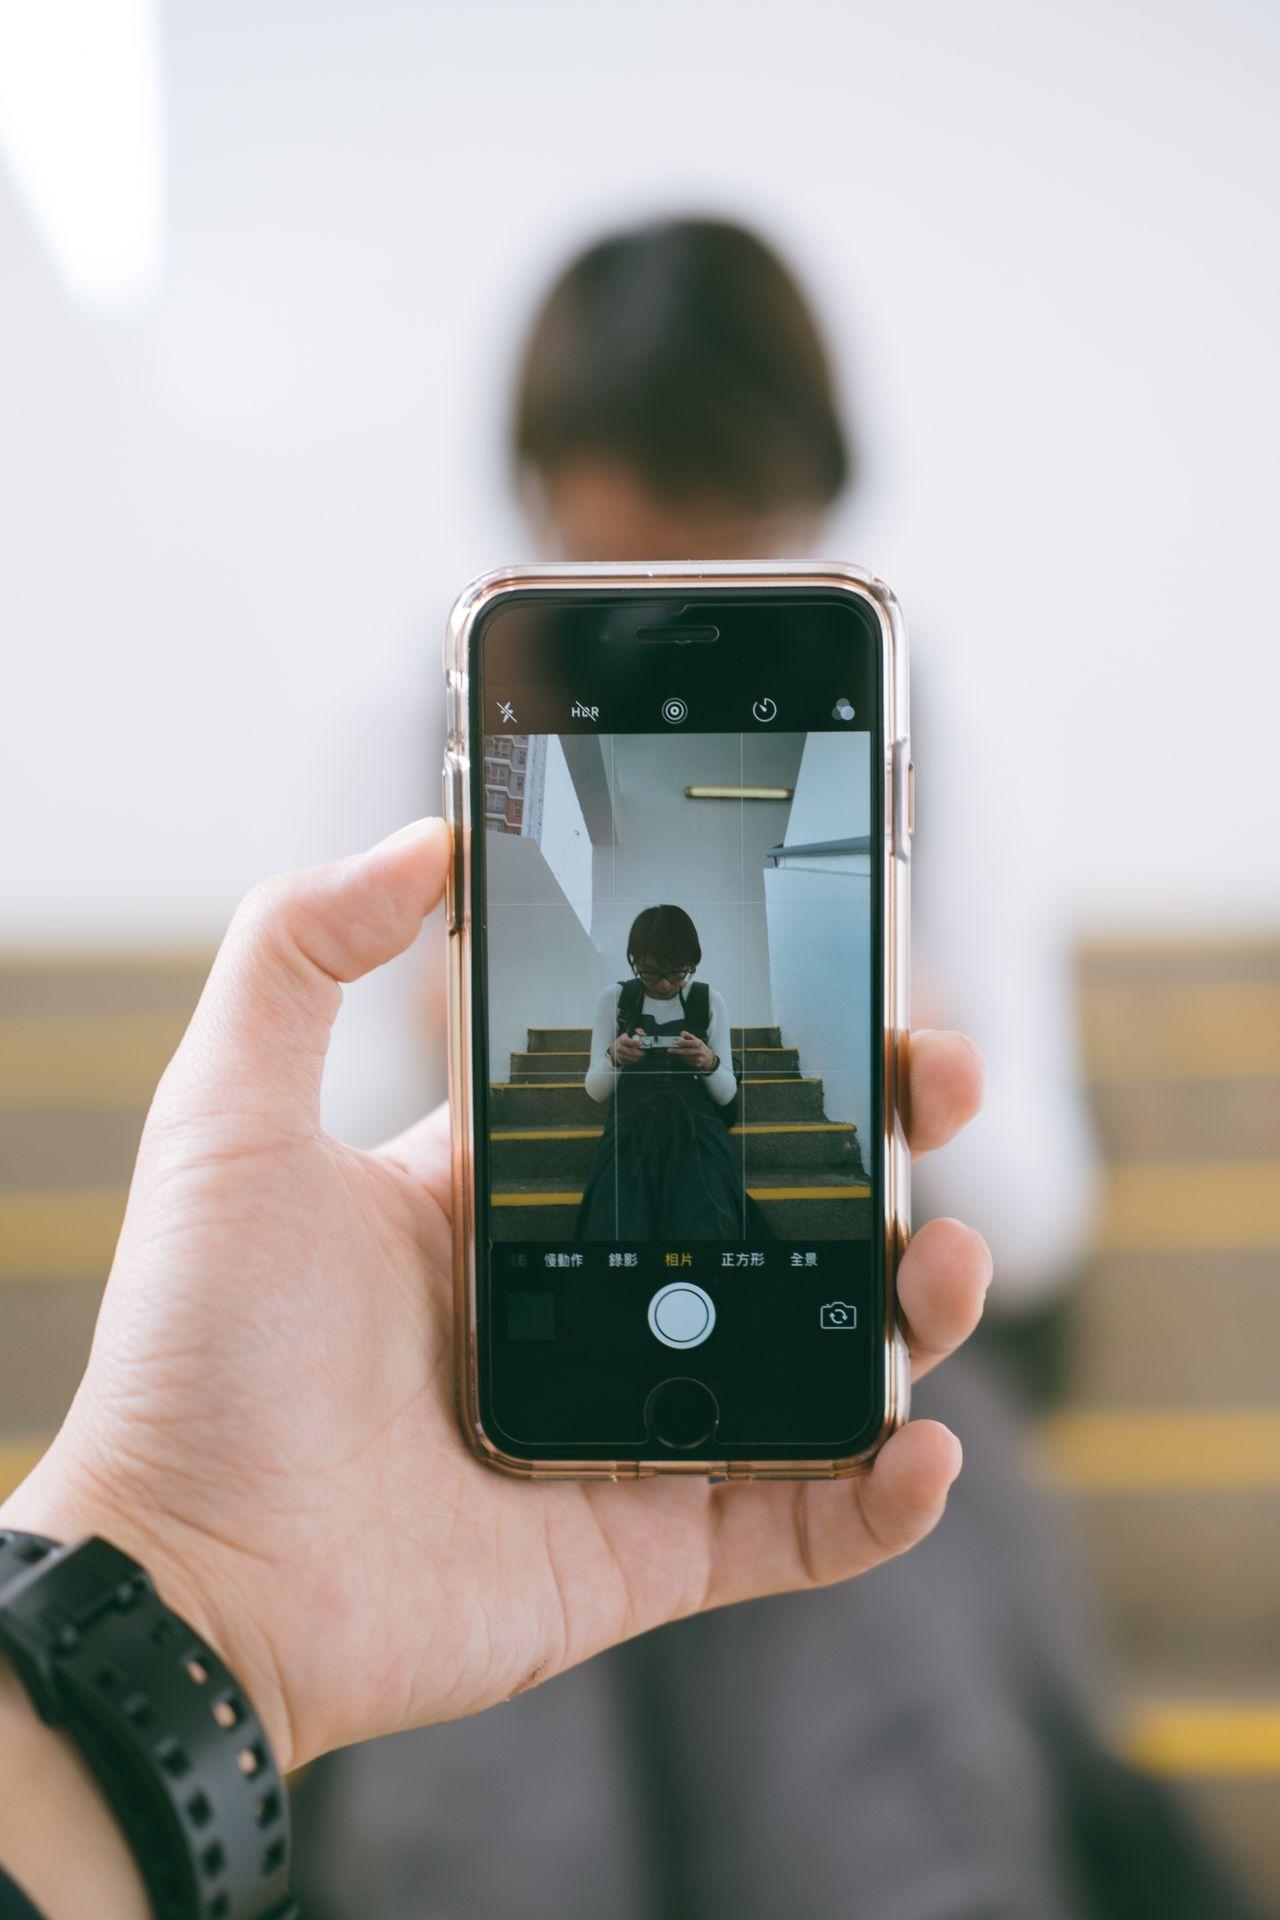 Mobile Phone Smart Phone Photography Themes IPhone Explore Hk FUJIFILM X-T1